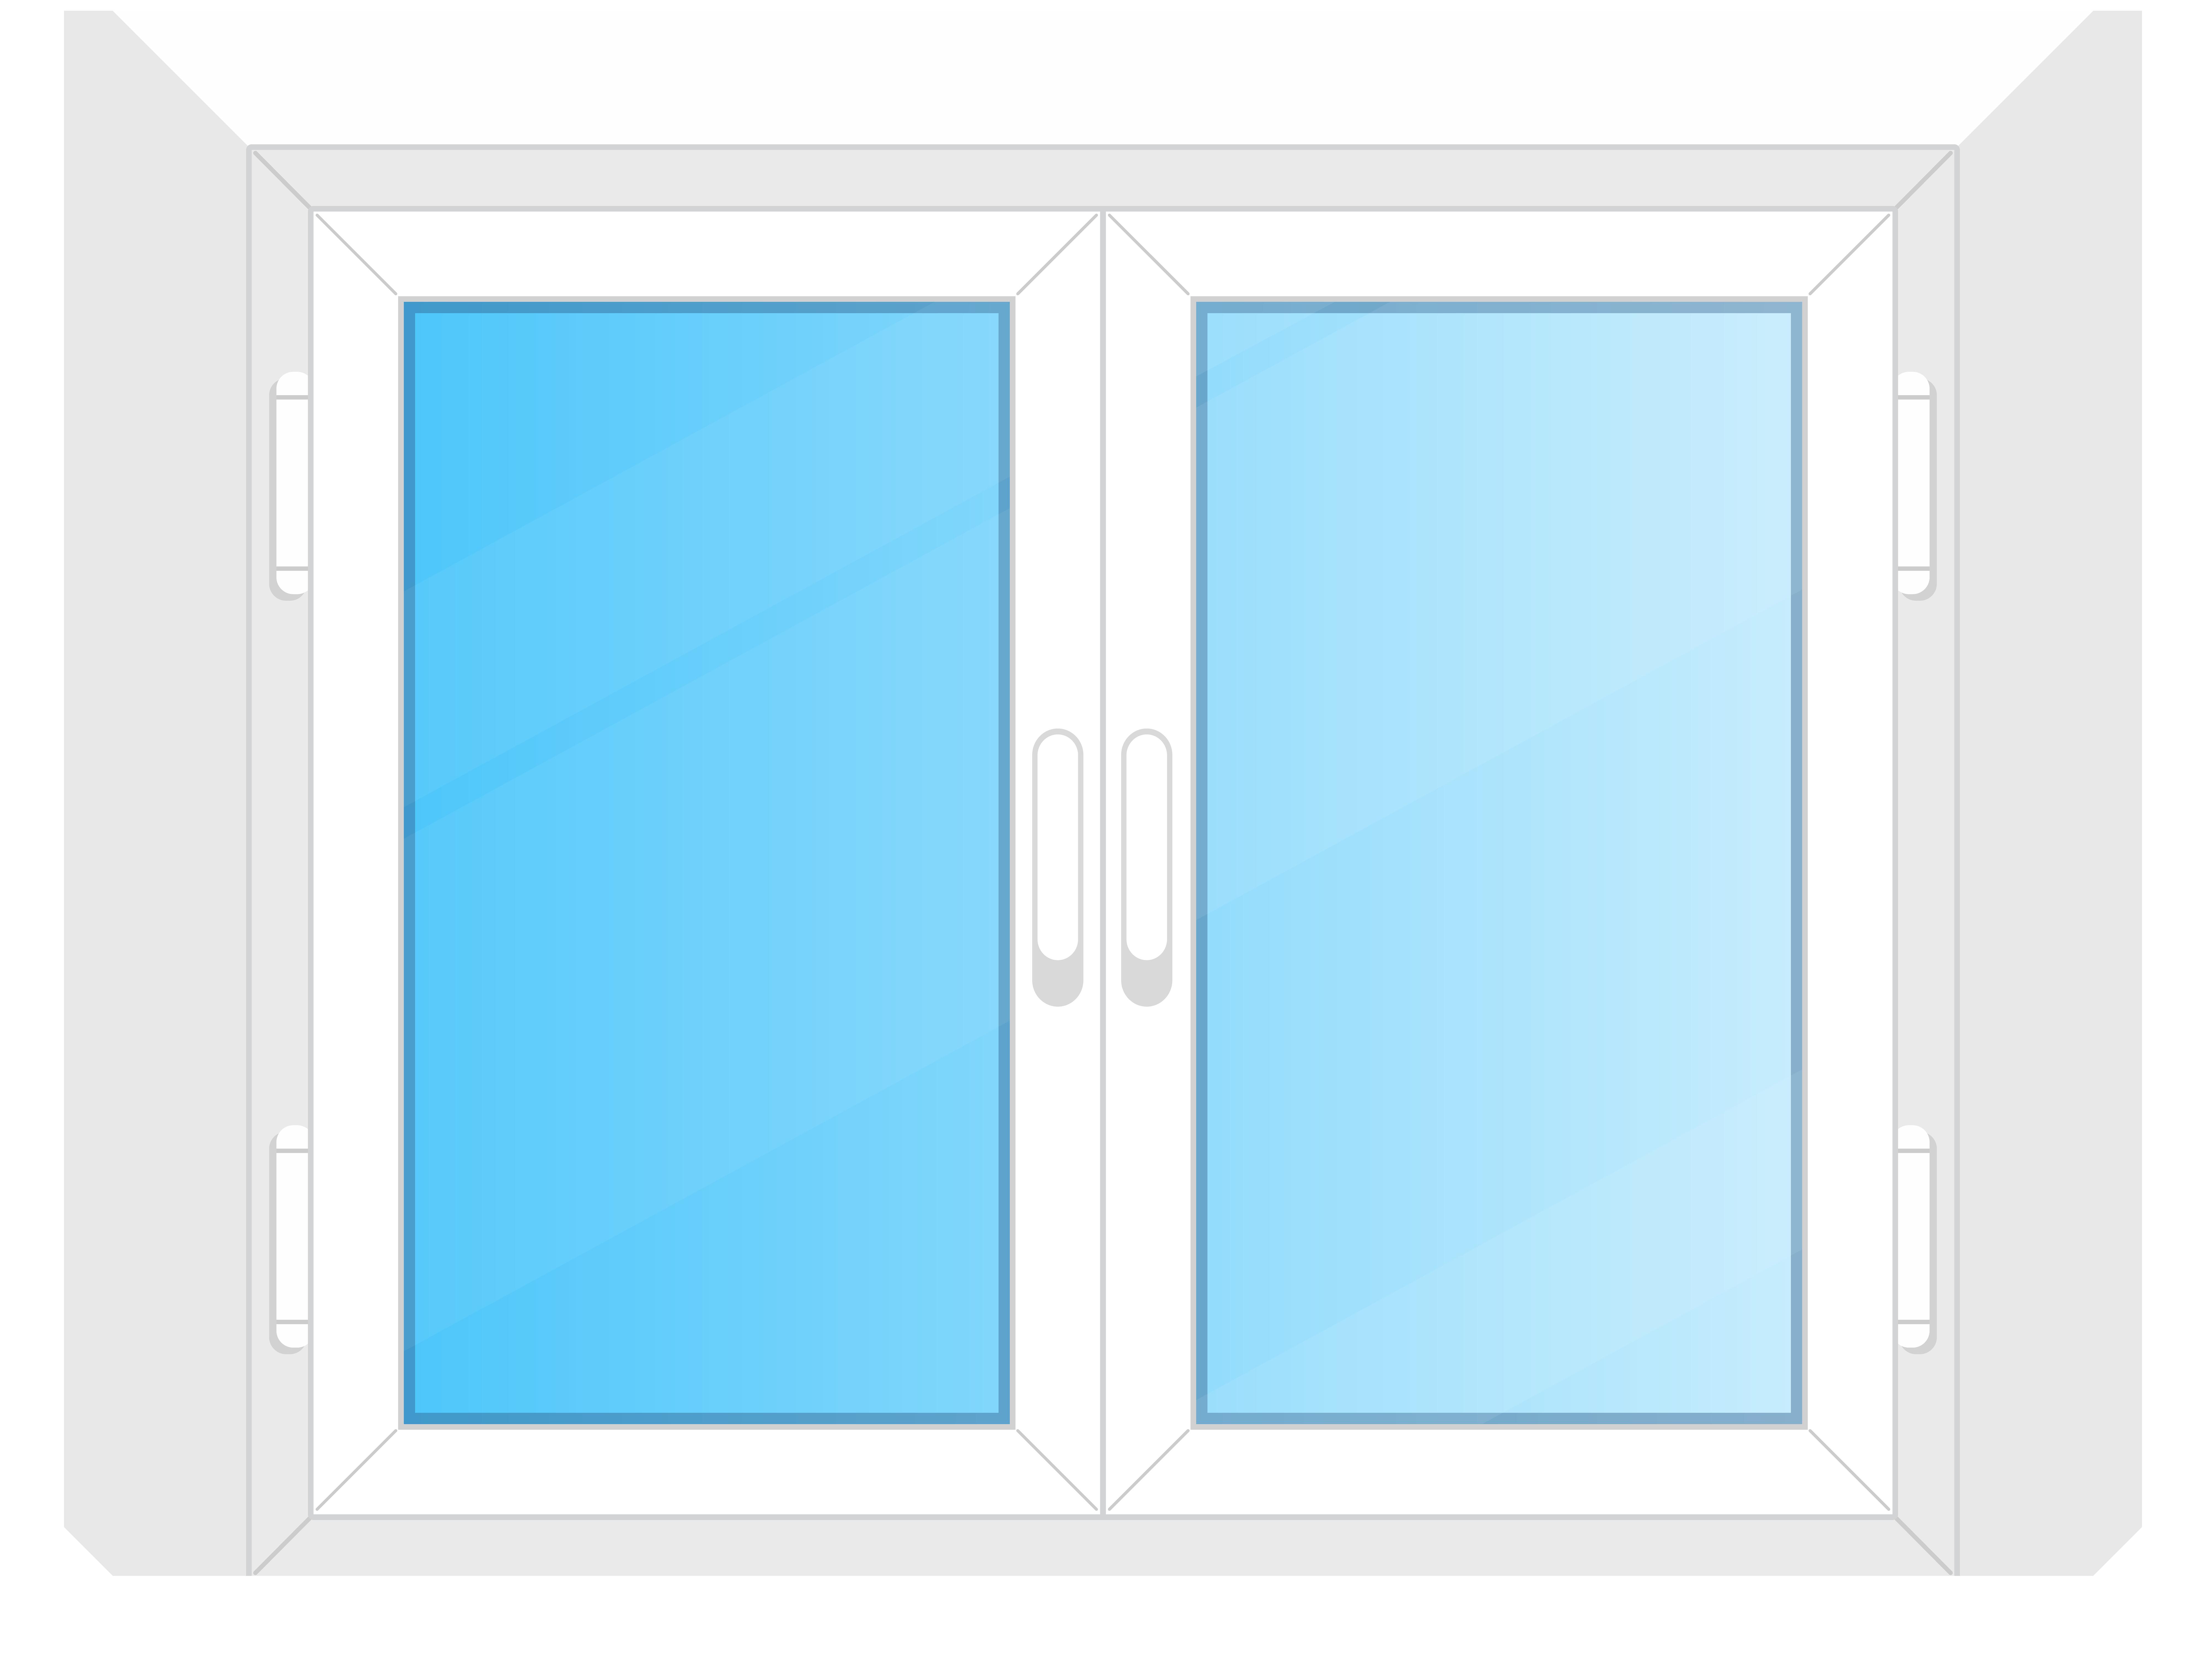 8000x6094 Window Png Clip Art